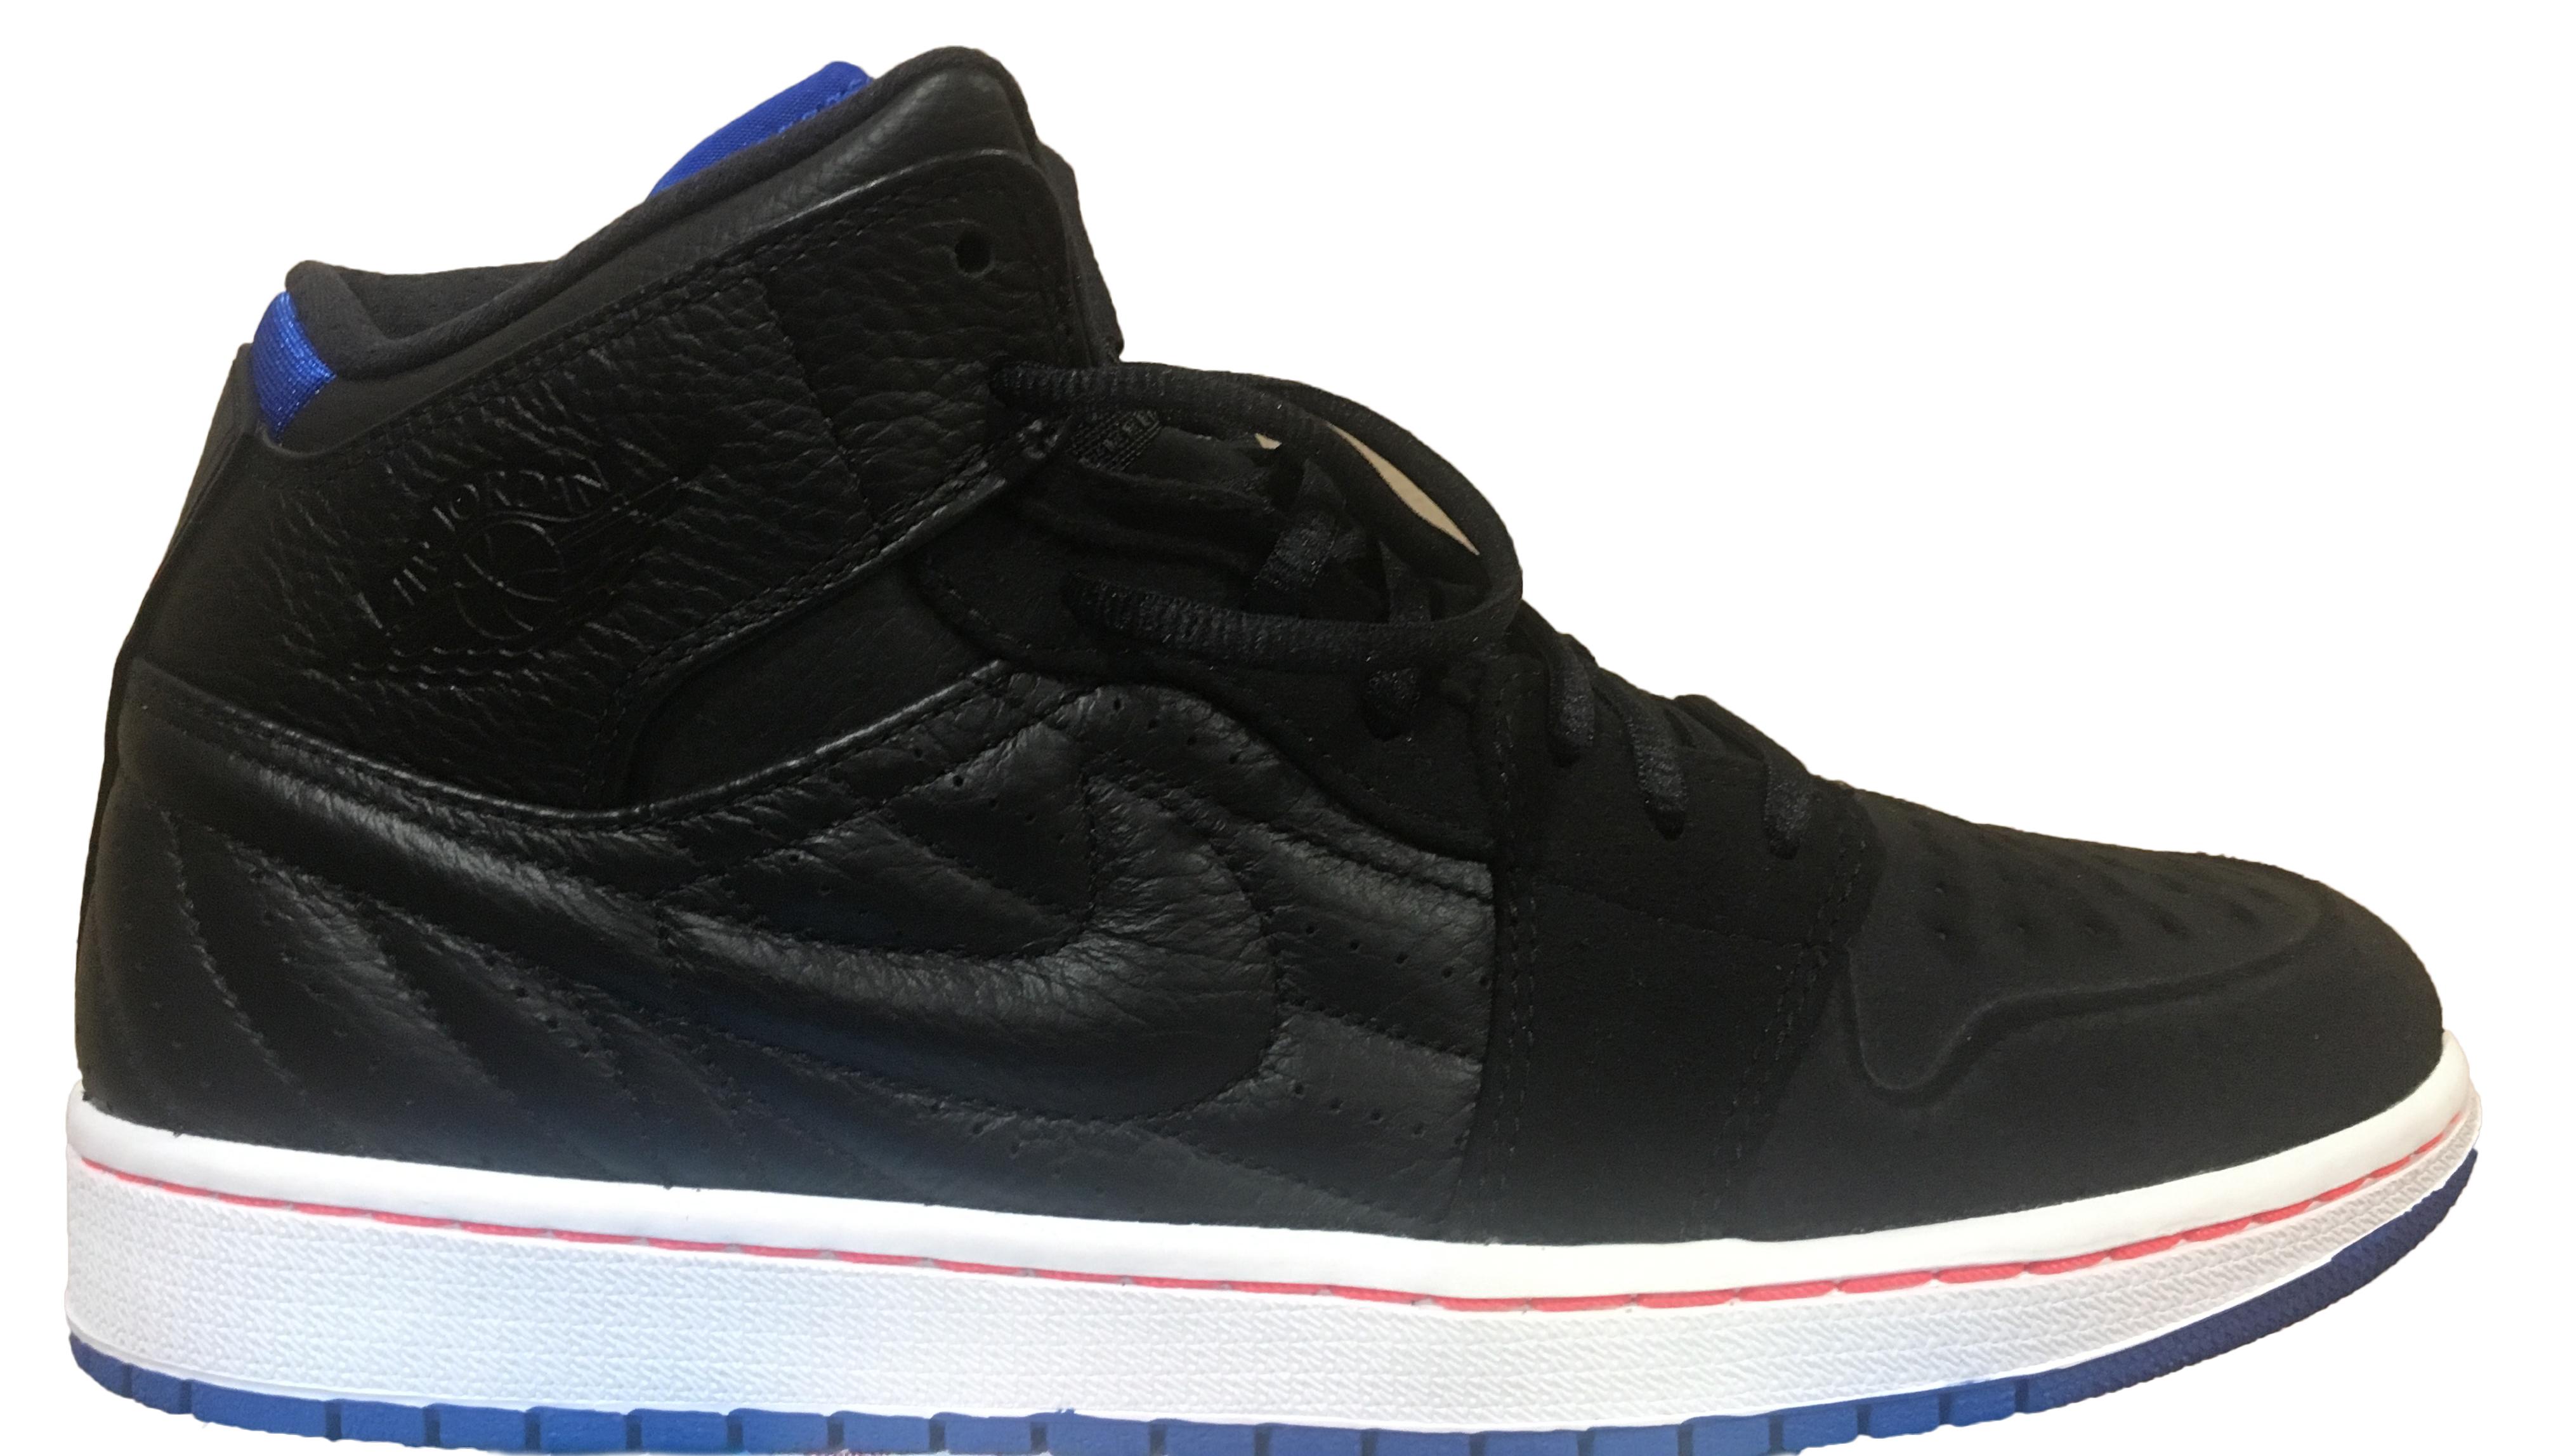 ca6307976e5 HypeAnalyzer · Jordan Air Jordan 1 Retro ' 99 Black/Sprt Bl-Infrrd 23-White